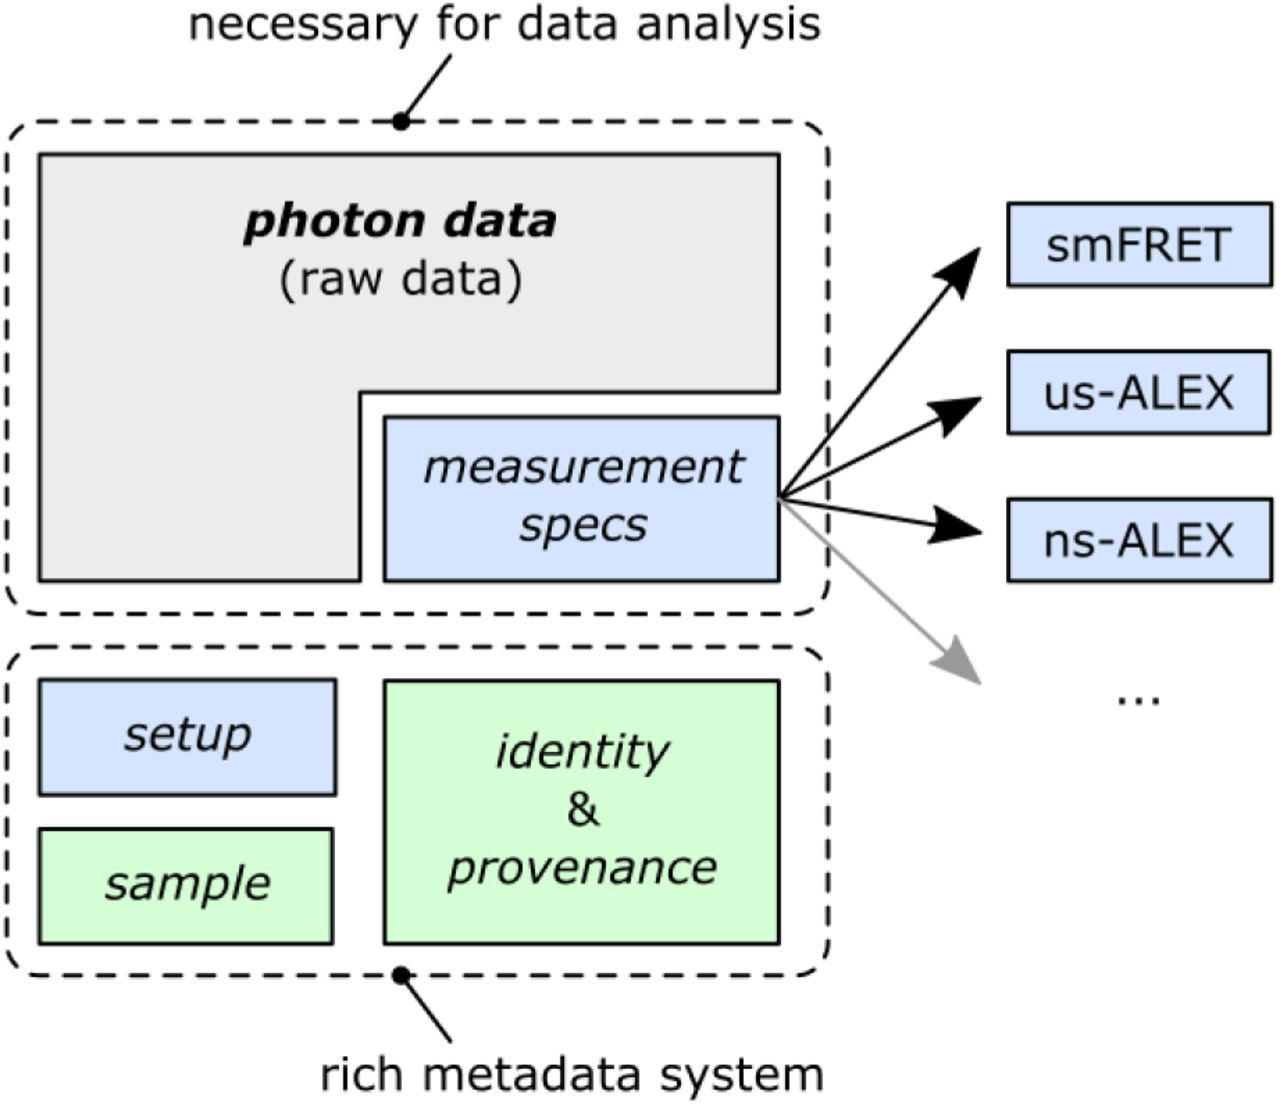 Photon-HDF5: an open file format for single-molecule fluorescence